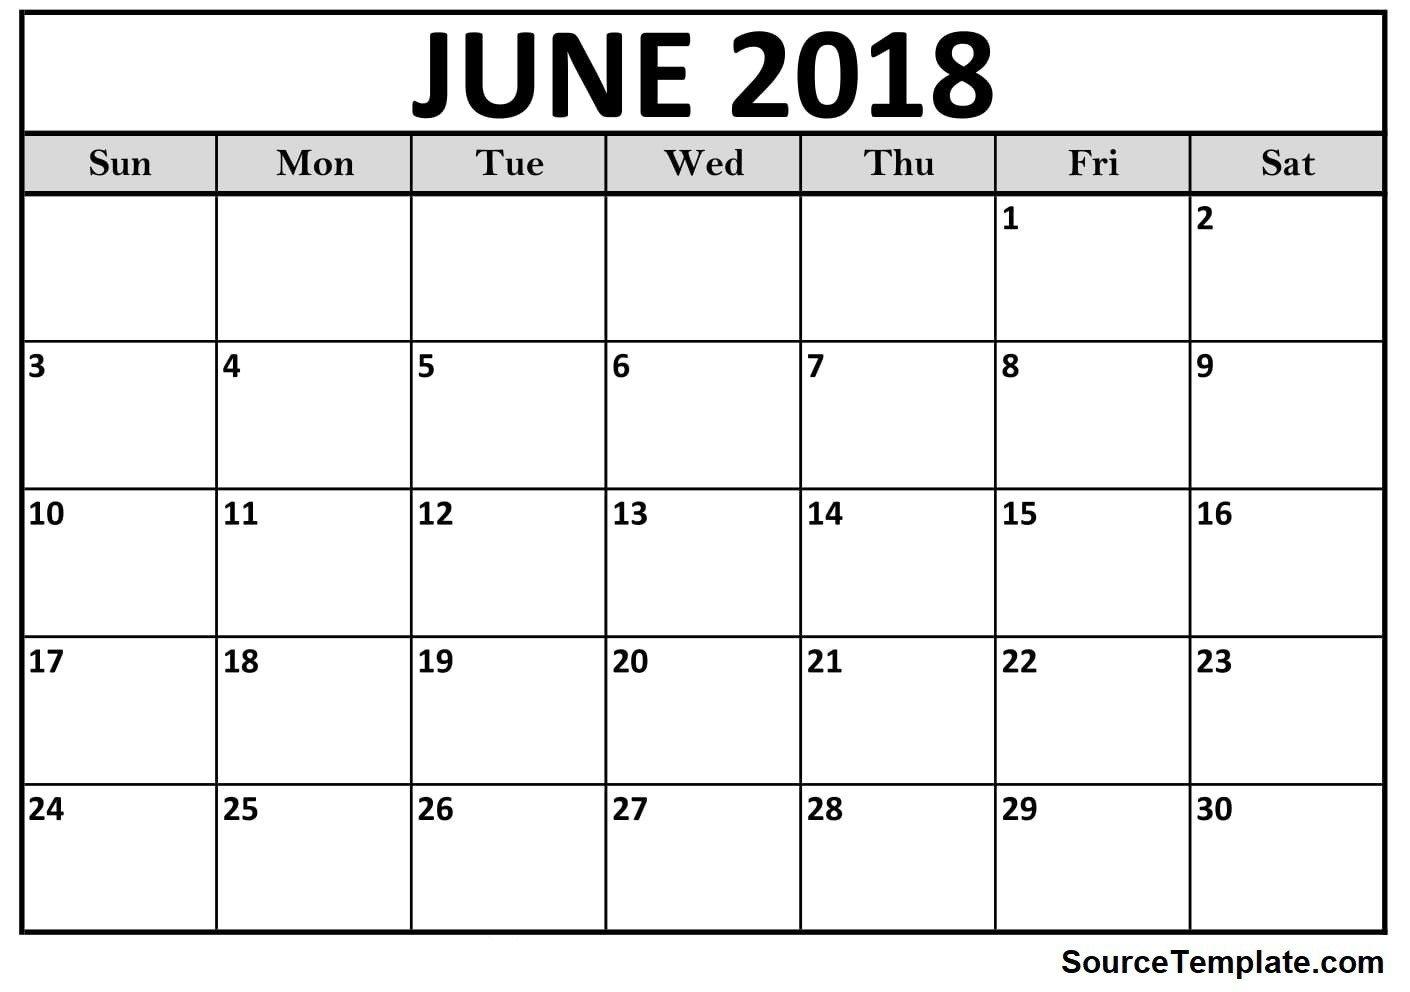 Free 5+ June 2018 Calendar Printable Template Pdf - Source